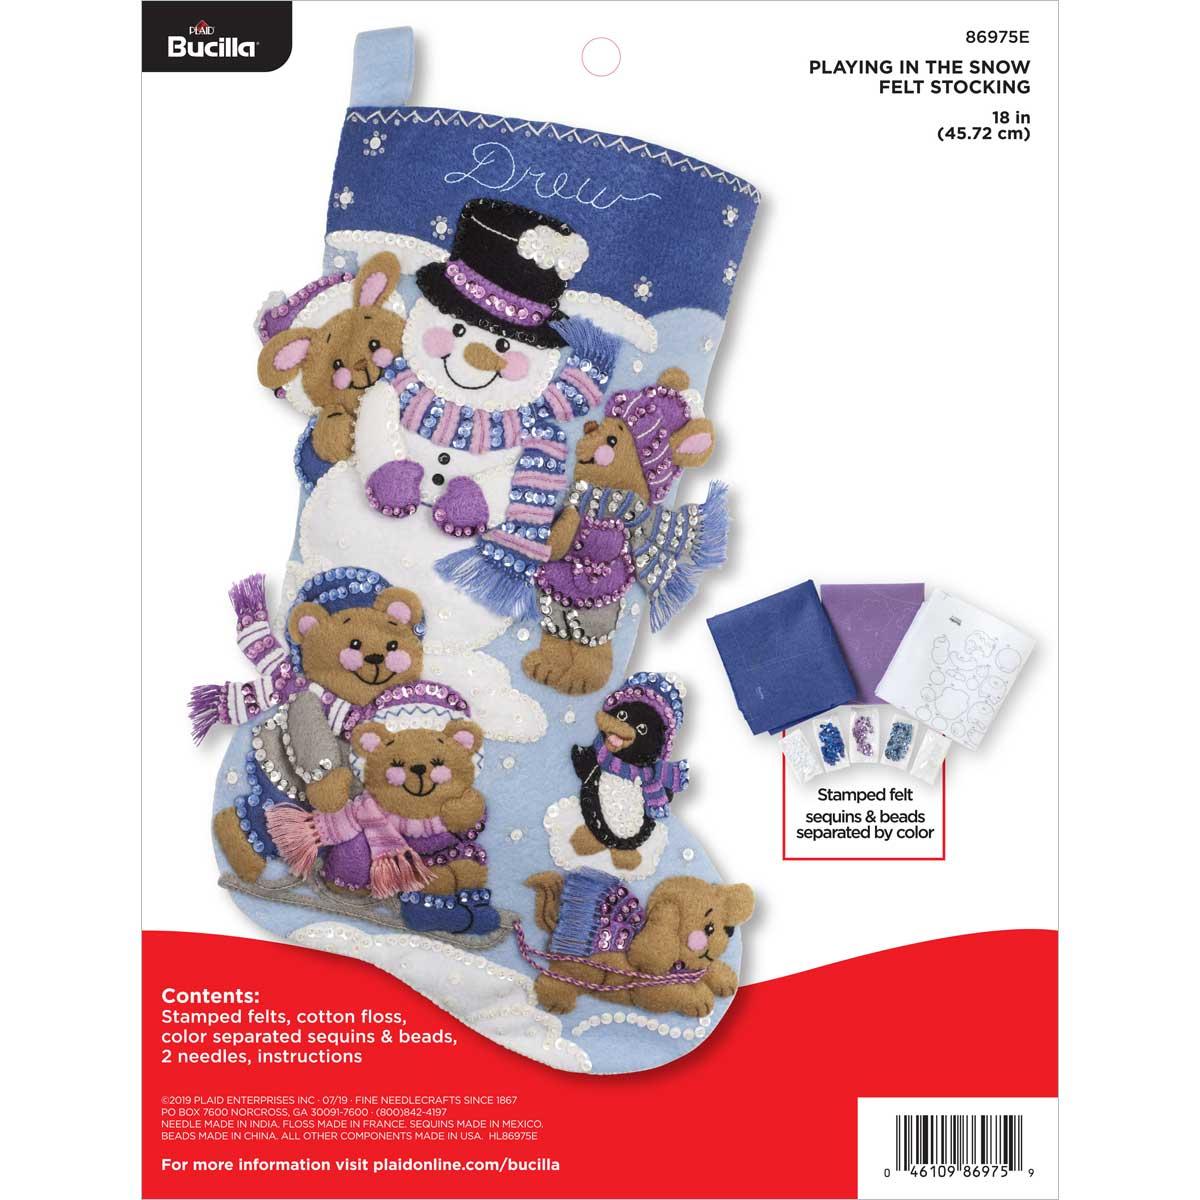 Bucilla ® Seasonal - Felt - Stocking Kits - Playing in the Snow